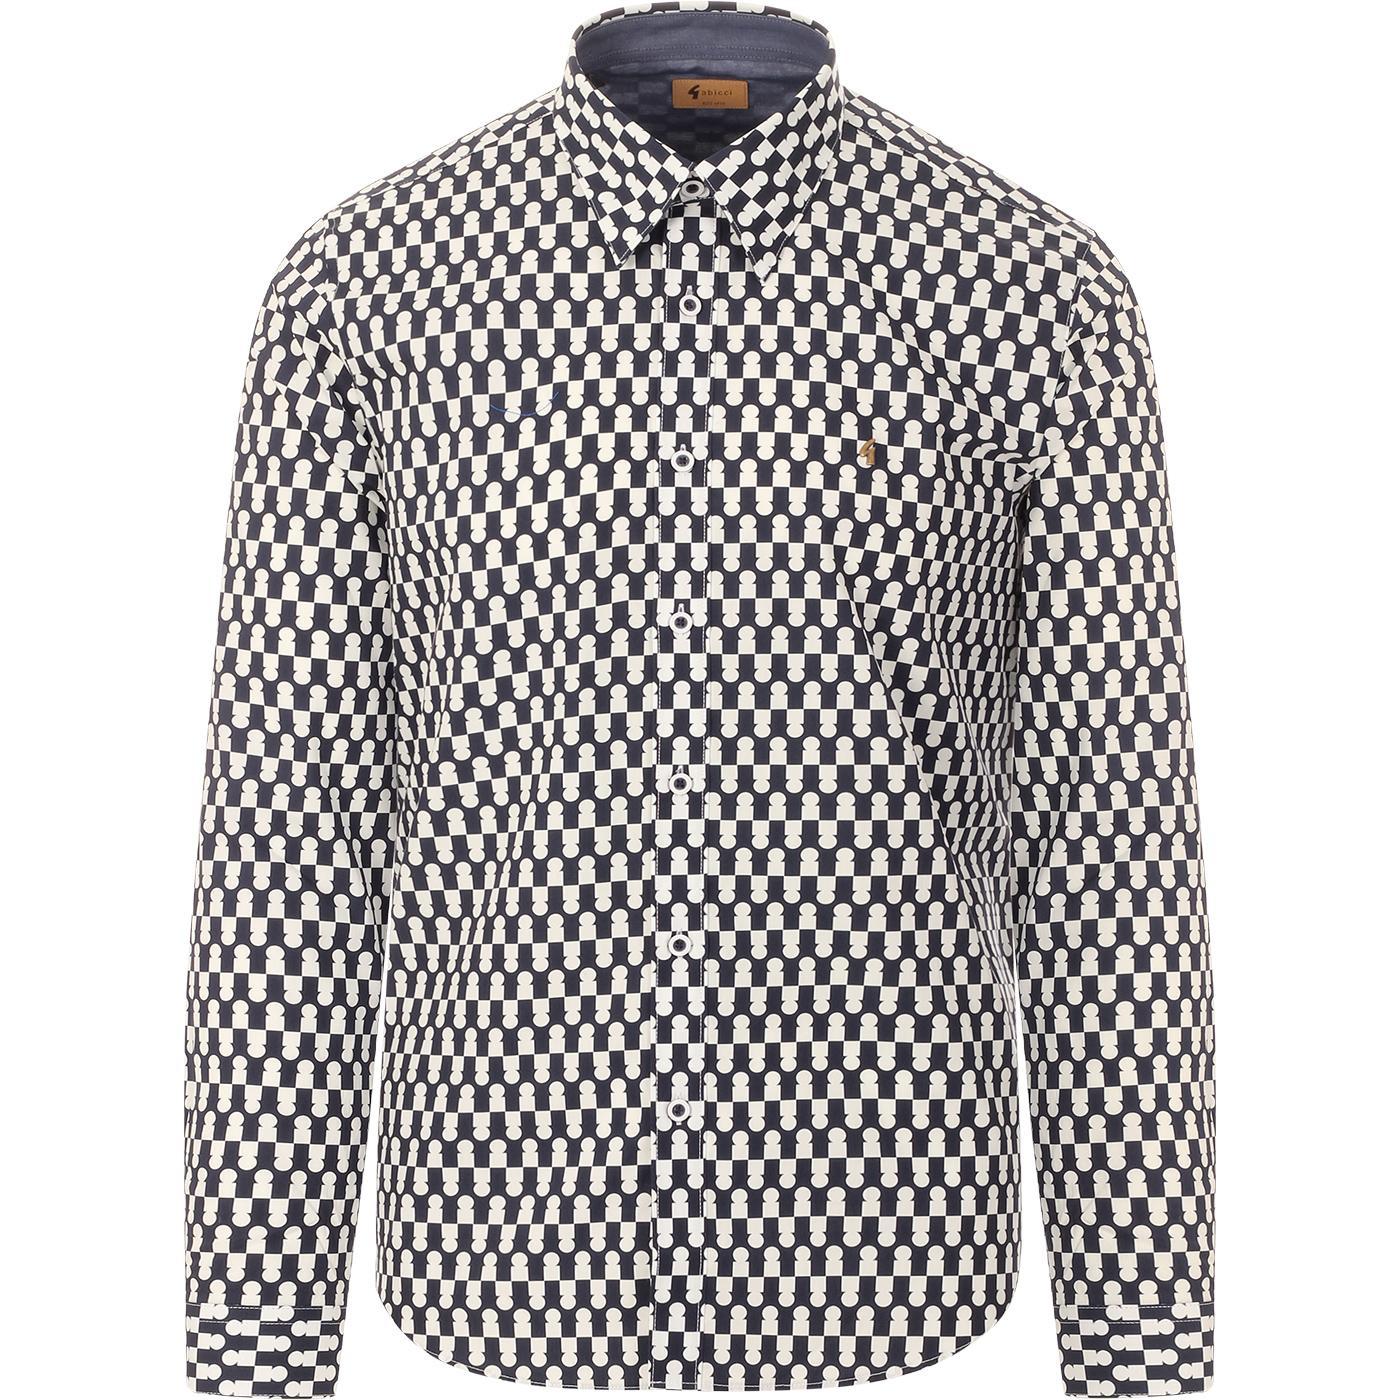 Wayne GABICCI VINTAGE Mod Button Under Shirt